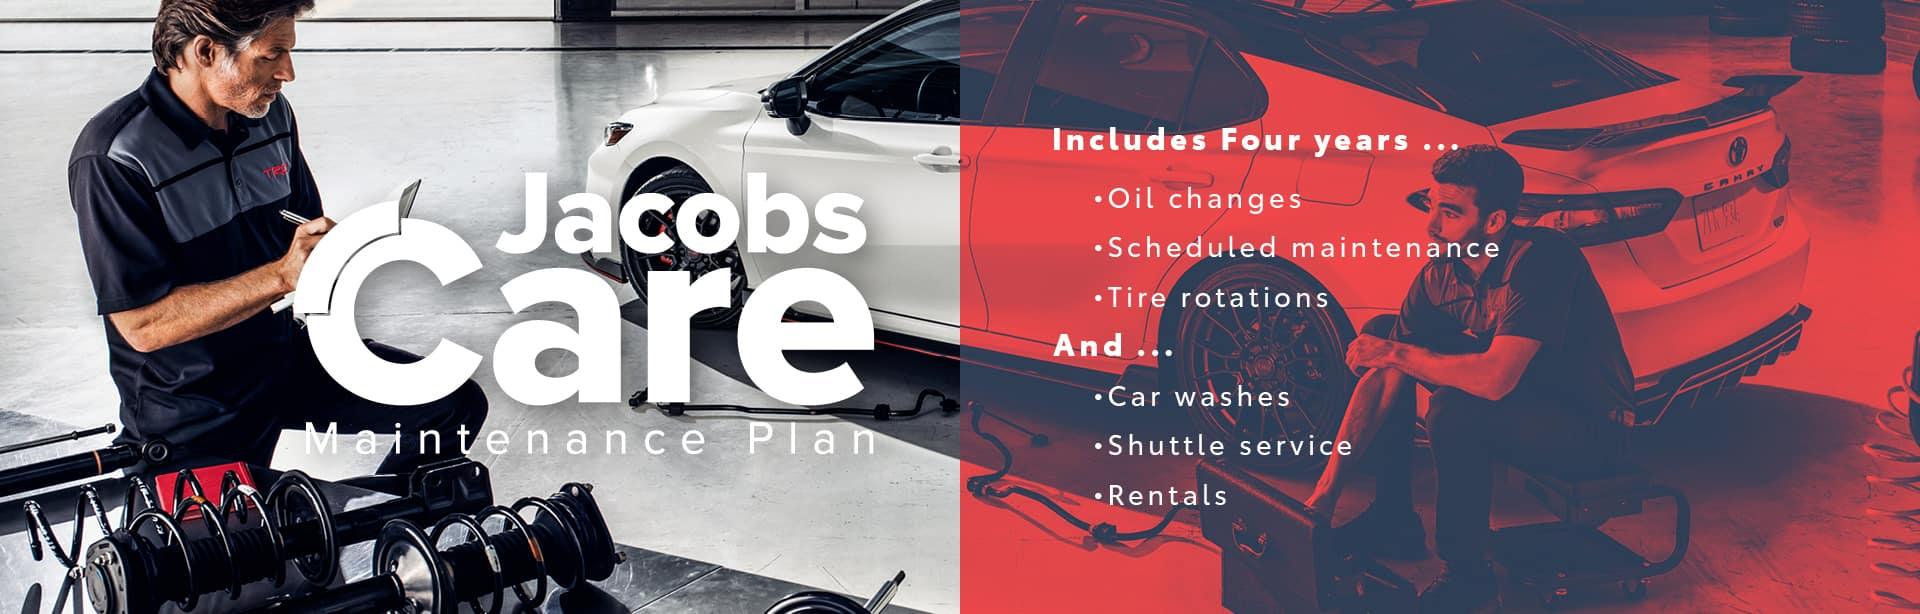 Jacobs Care Maintenance Plan